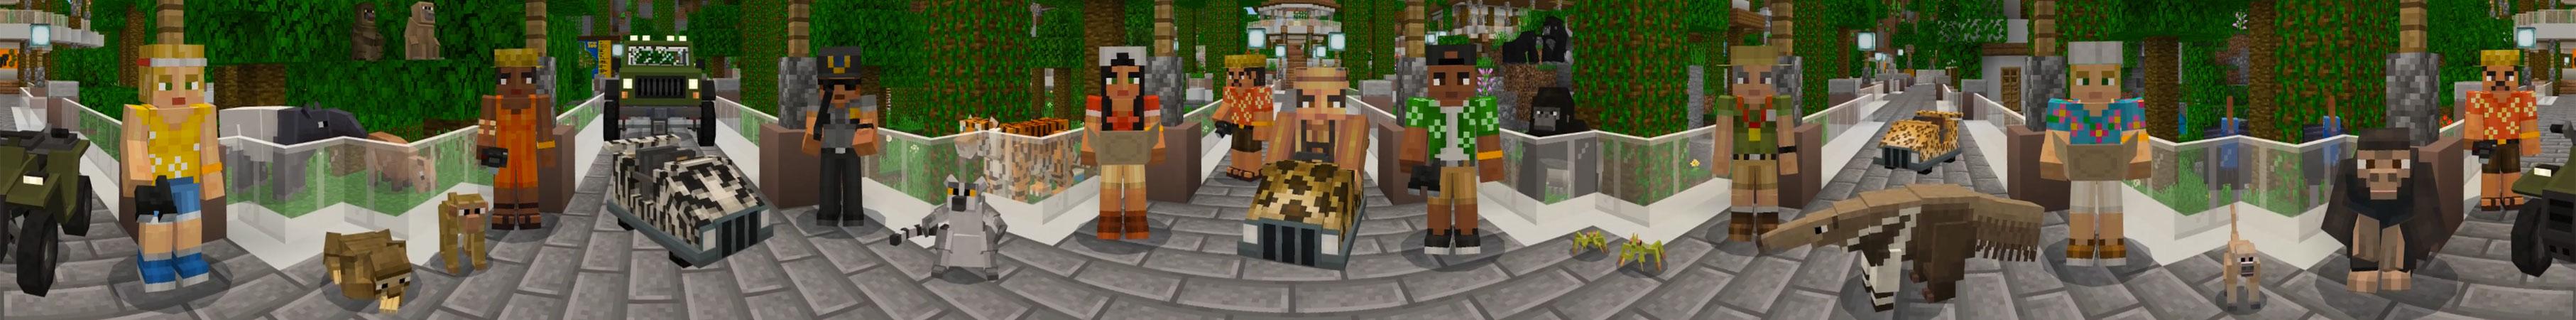 Jungle Zoo in Minecraft Marketplace  Minecraft